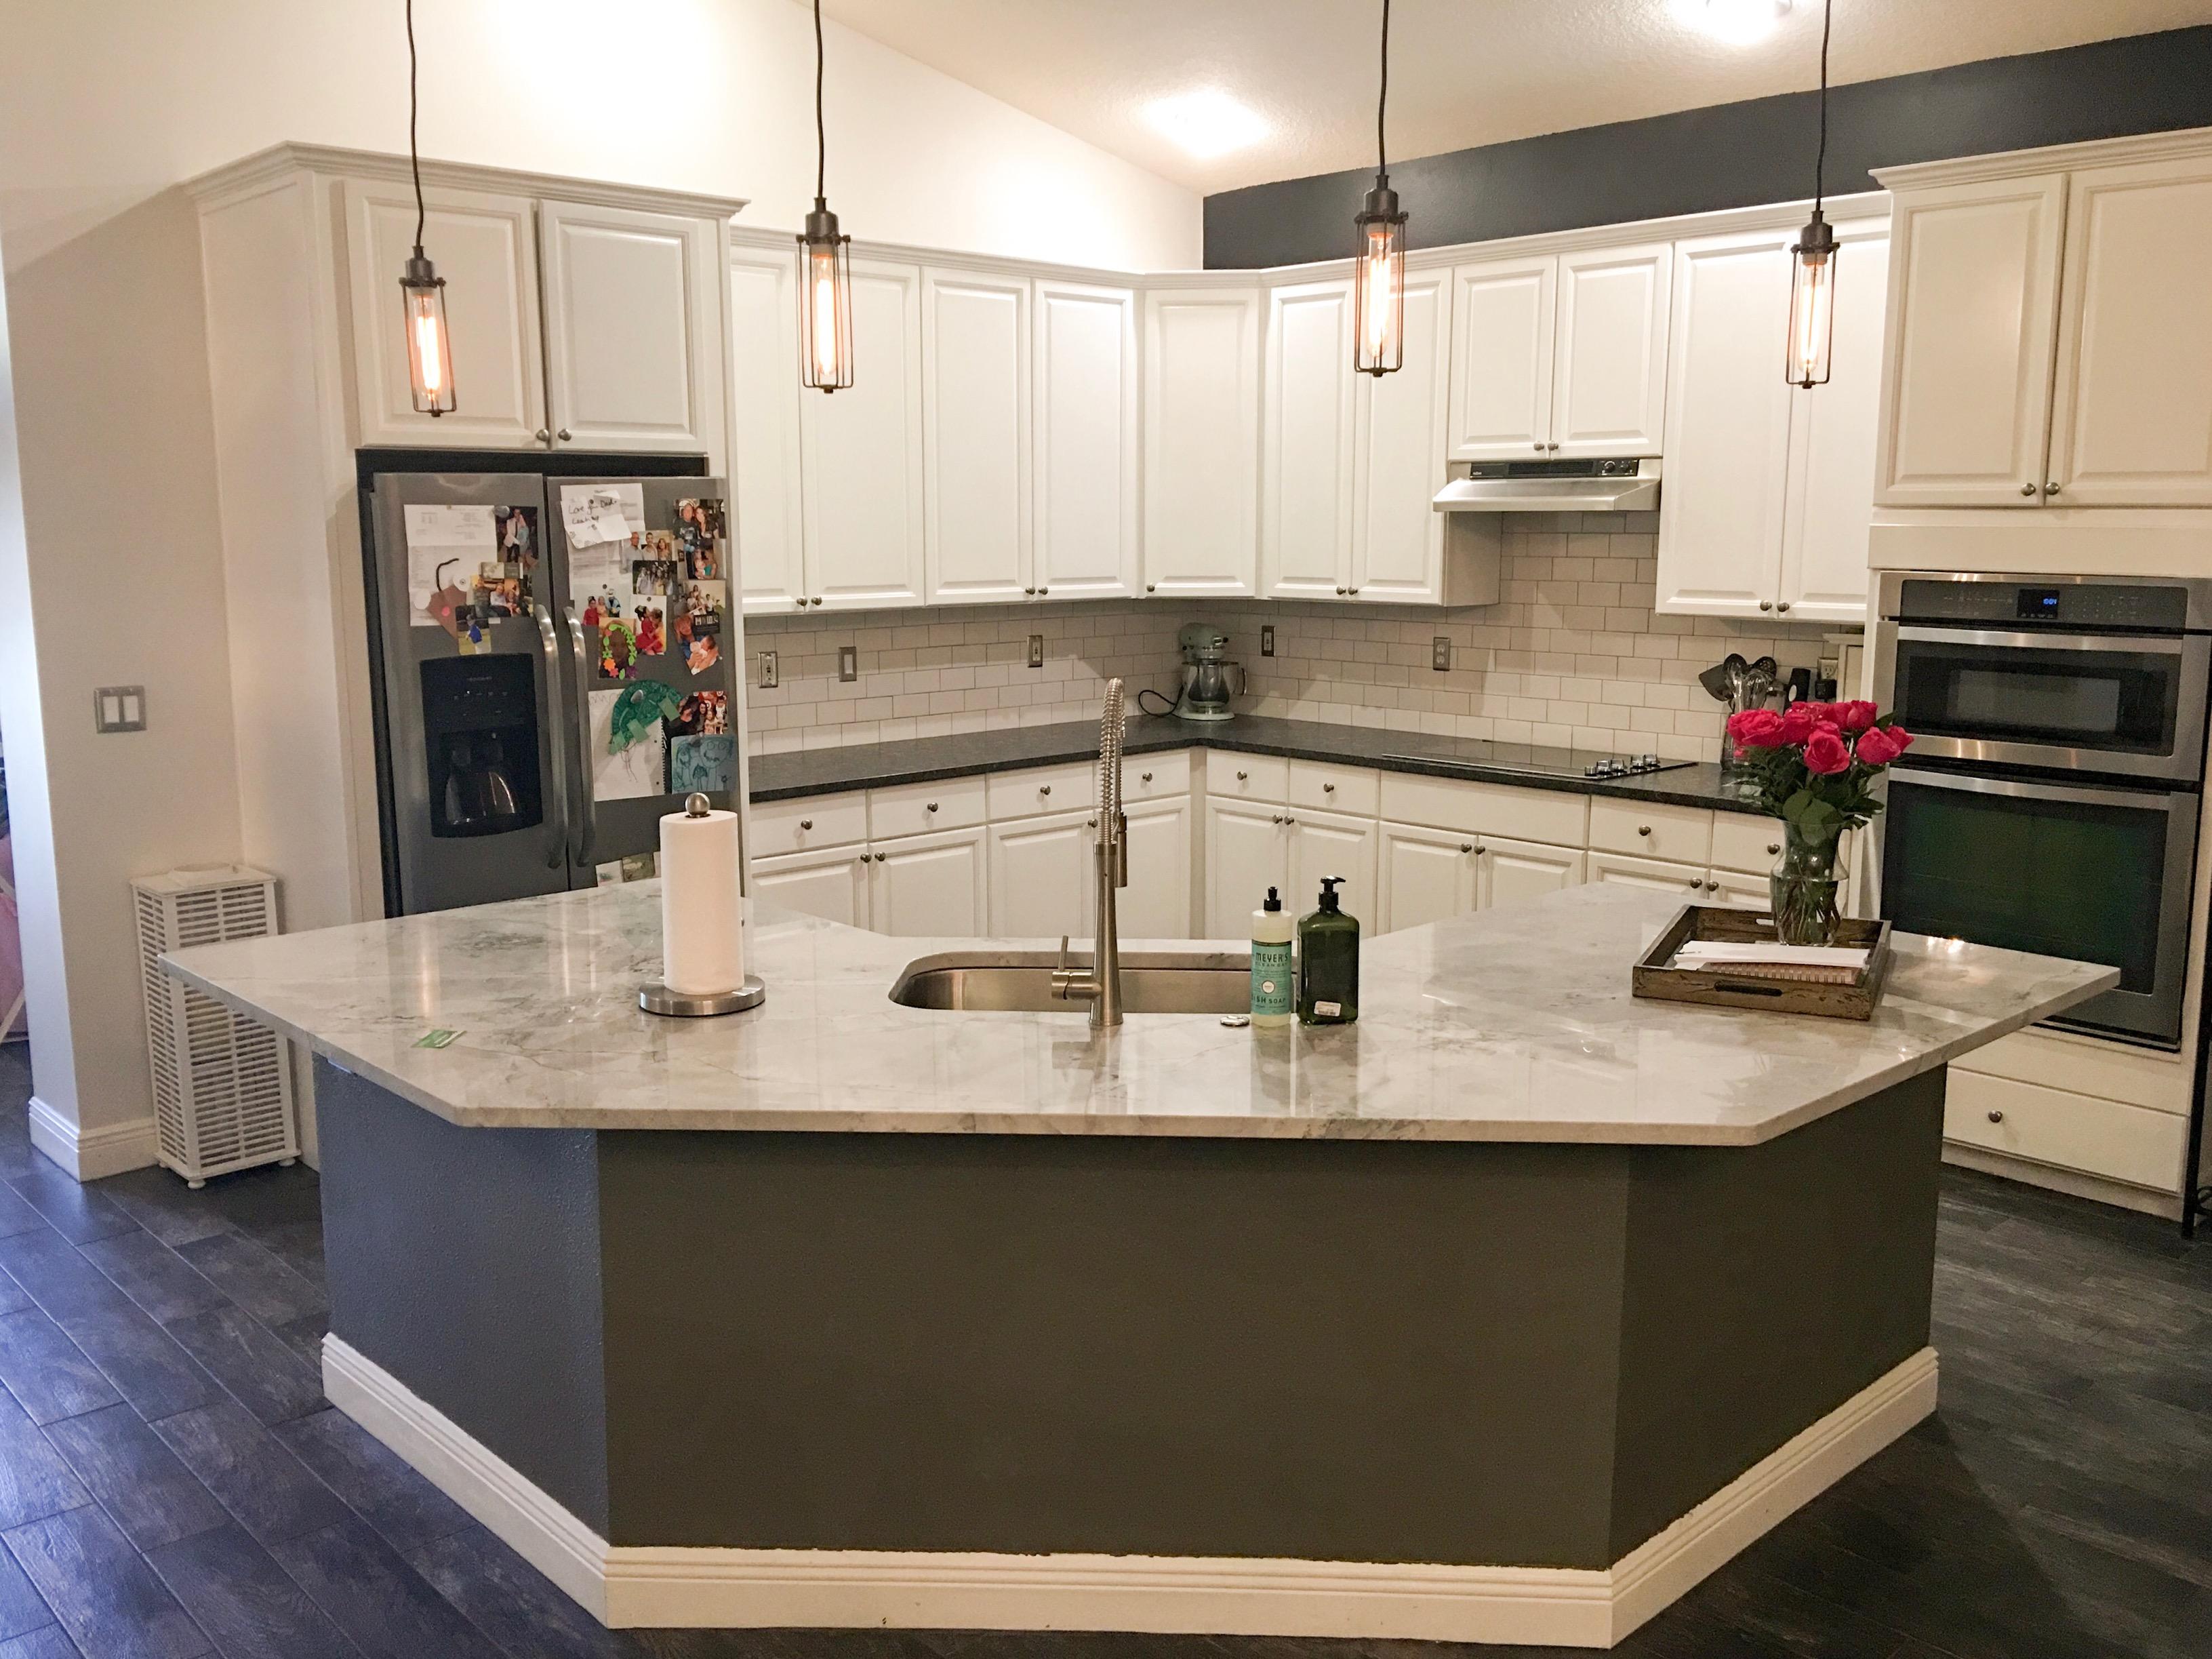 s granite countertop installer bathroom fabrication d countertops kitchen quartz fabricator installation tampa